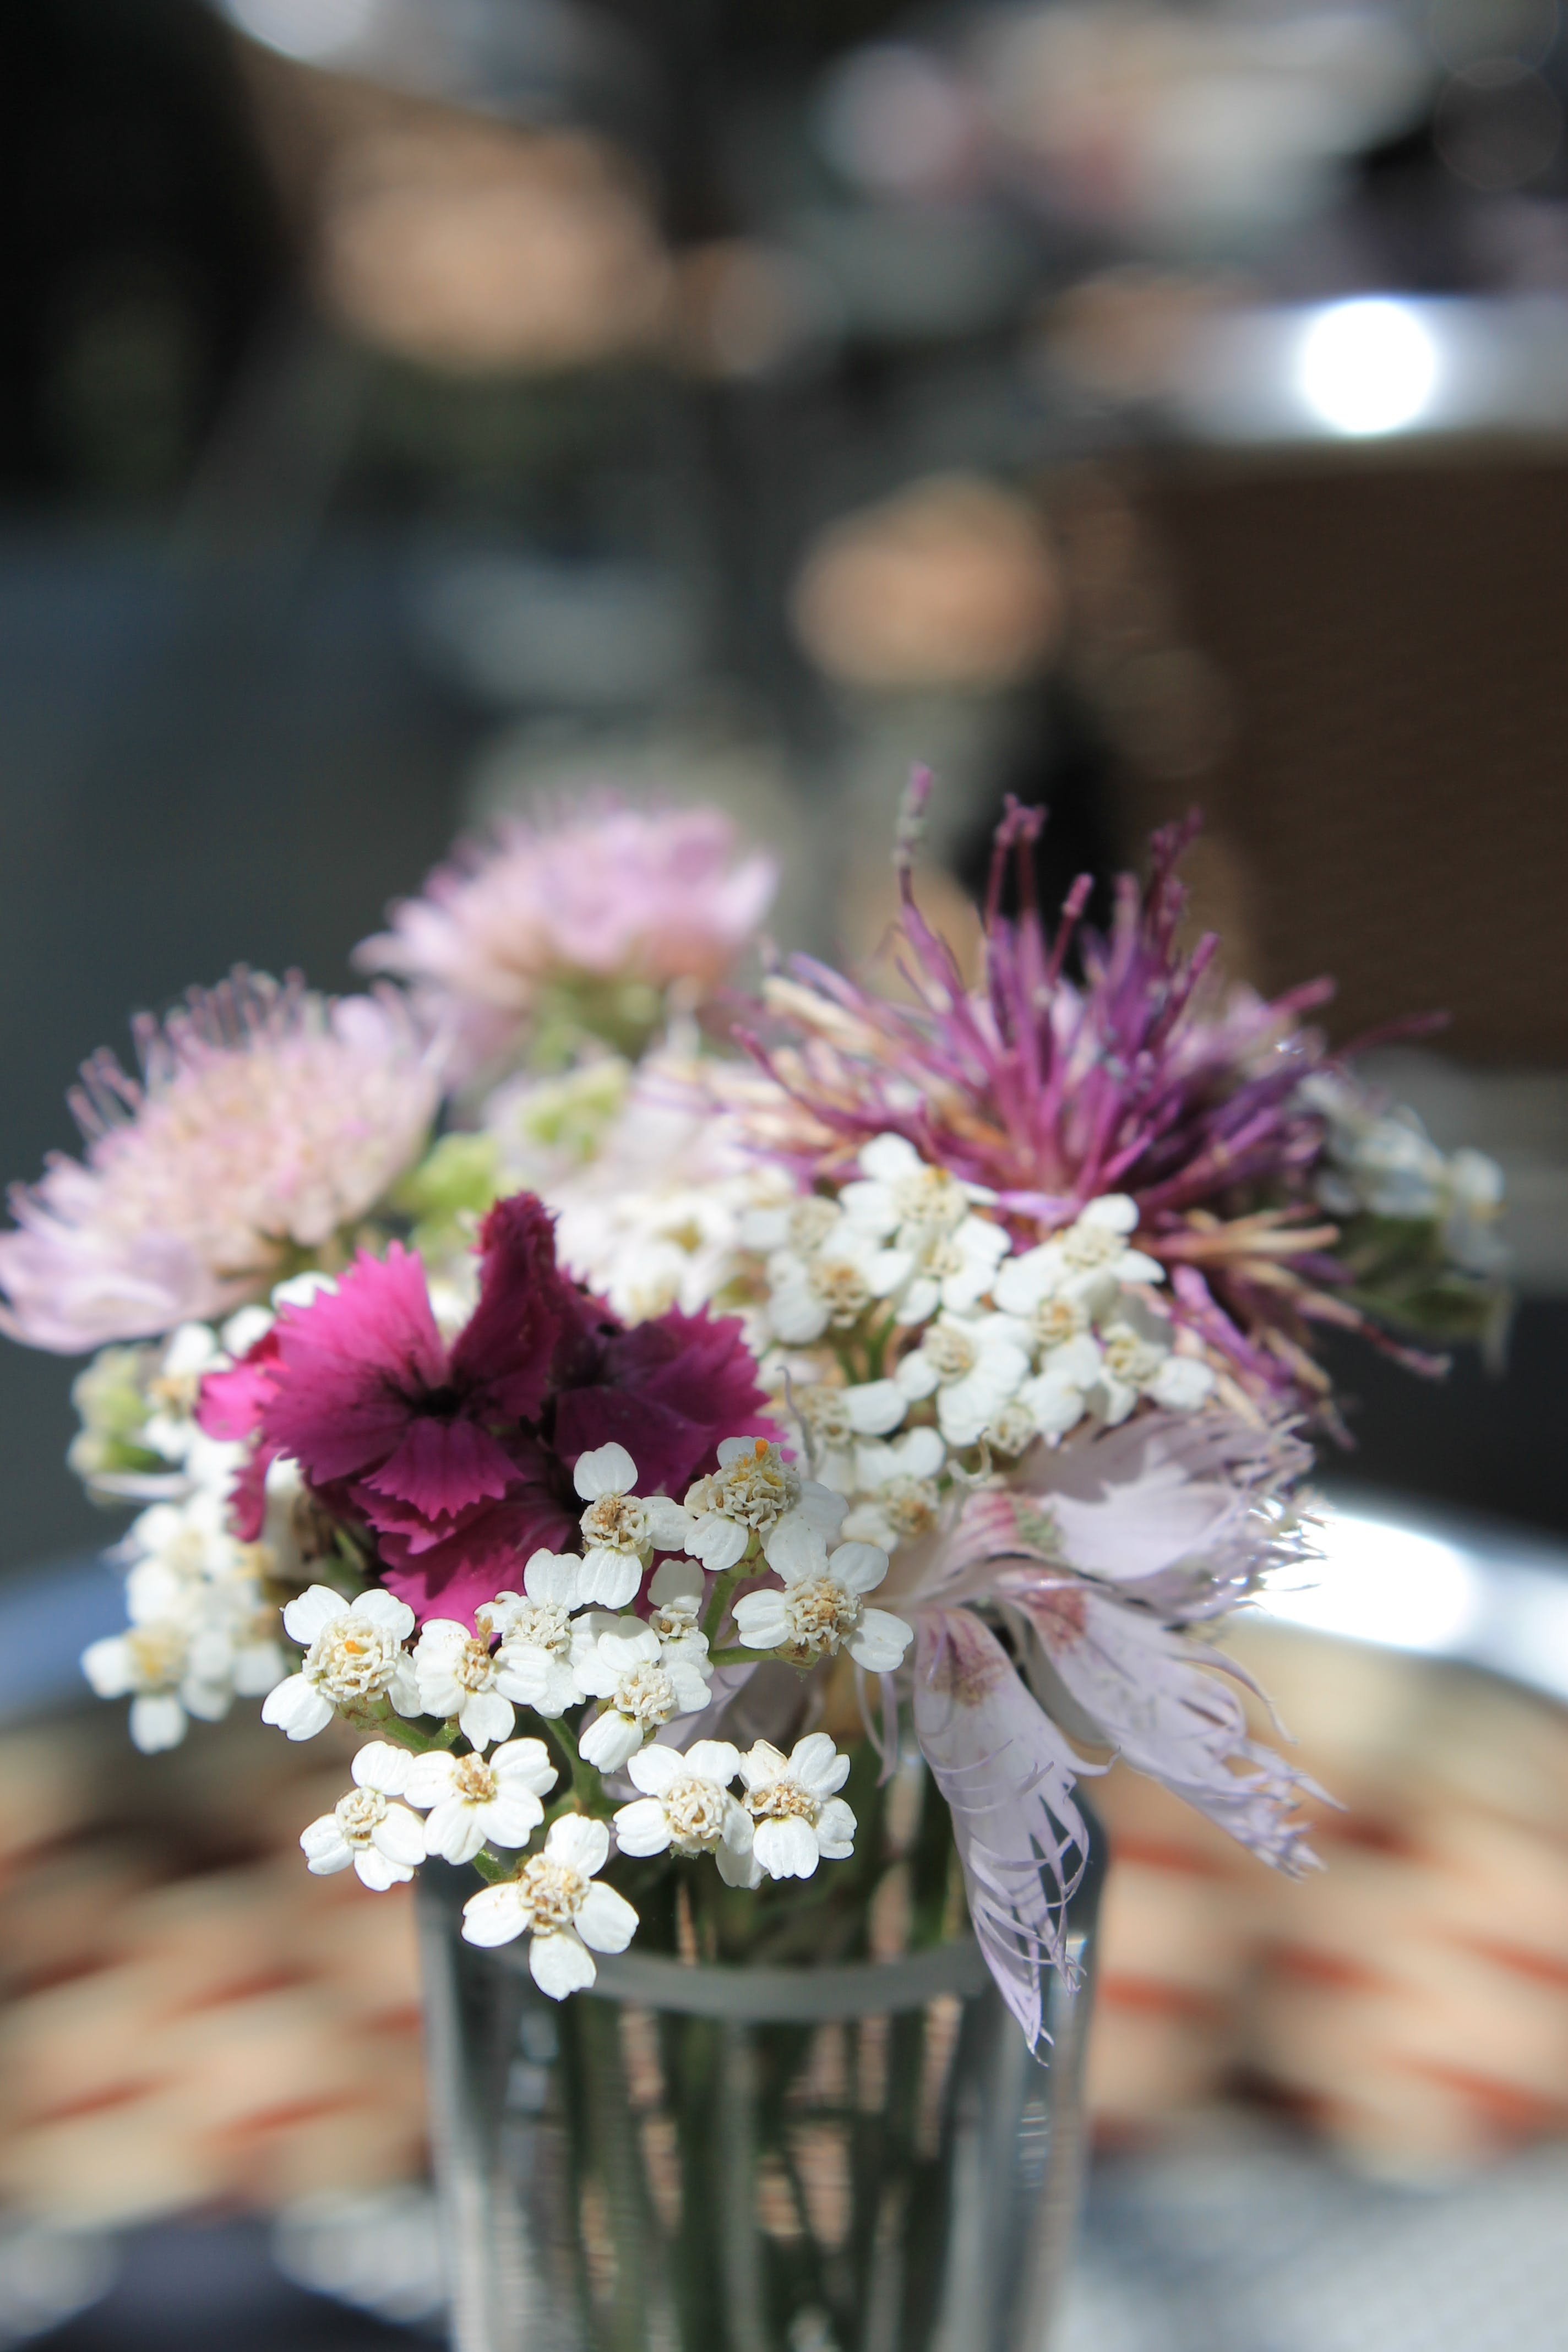 Close-up Photo of Bouquet